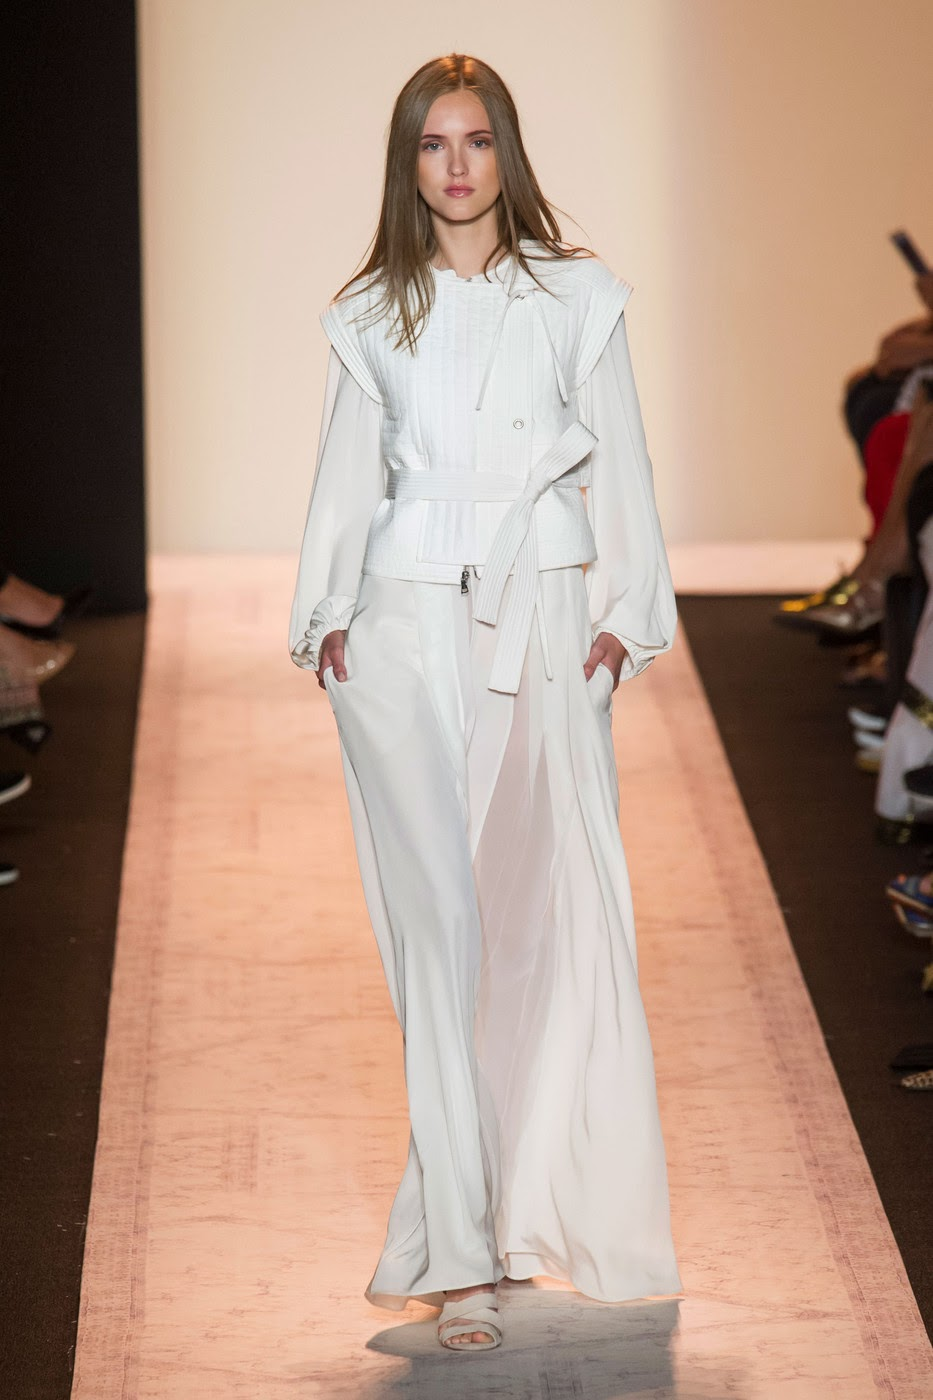 Bcbg max azria fashion show 2018 97